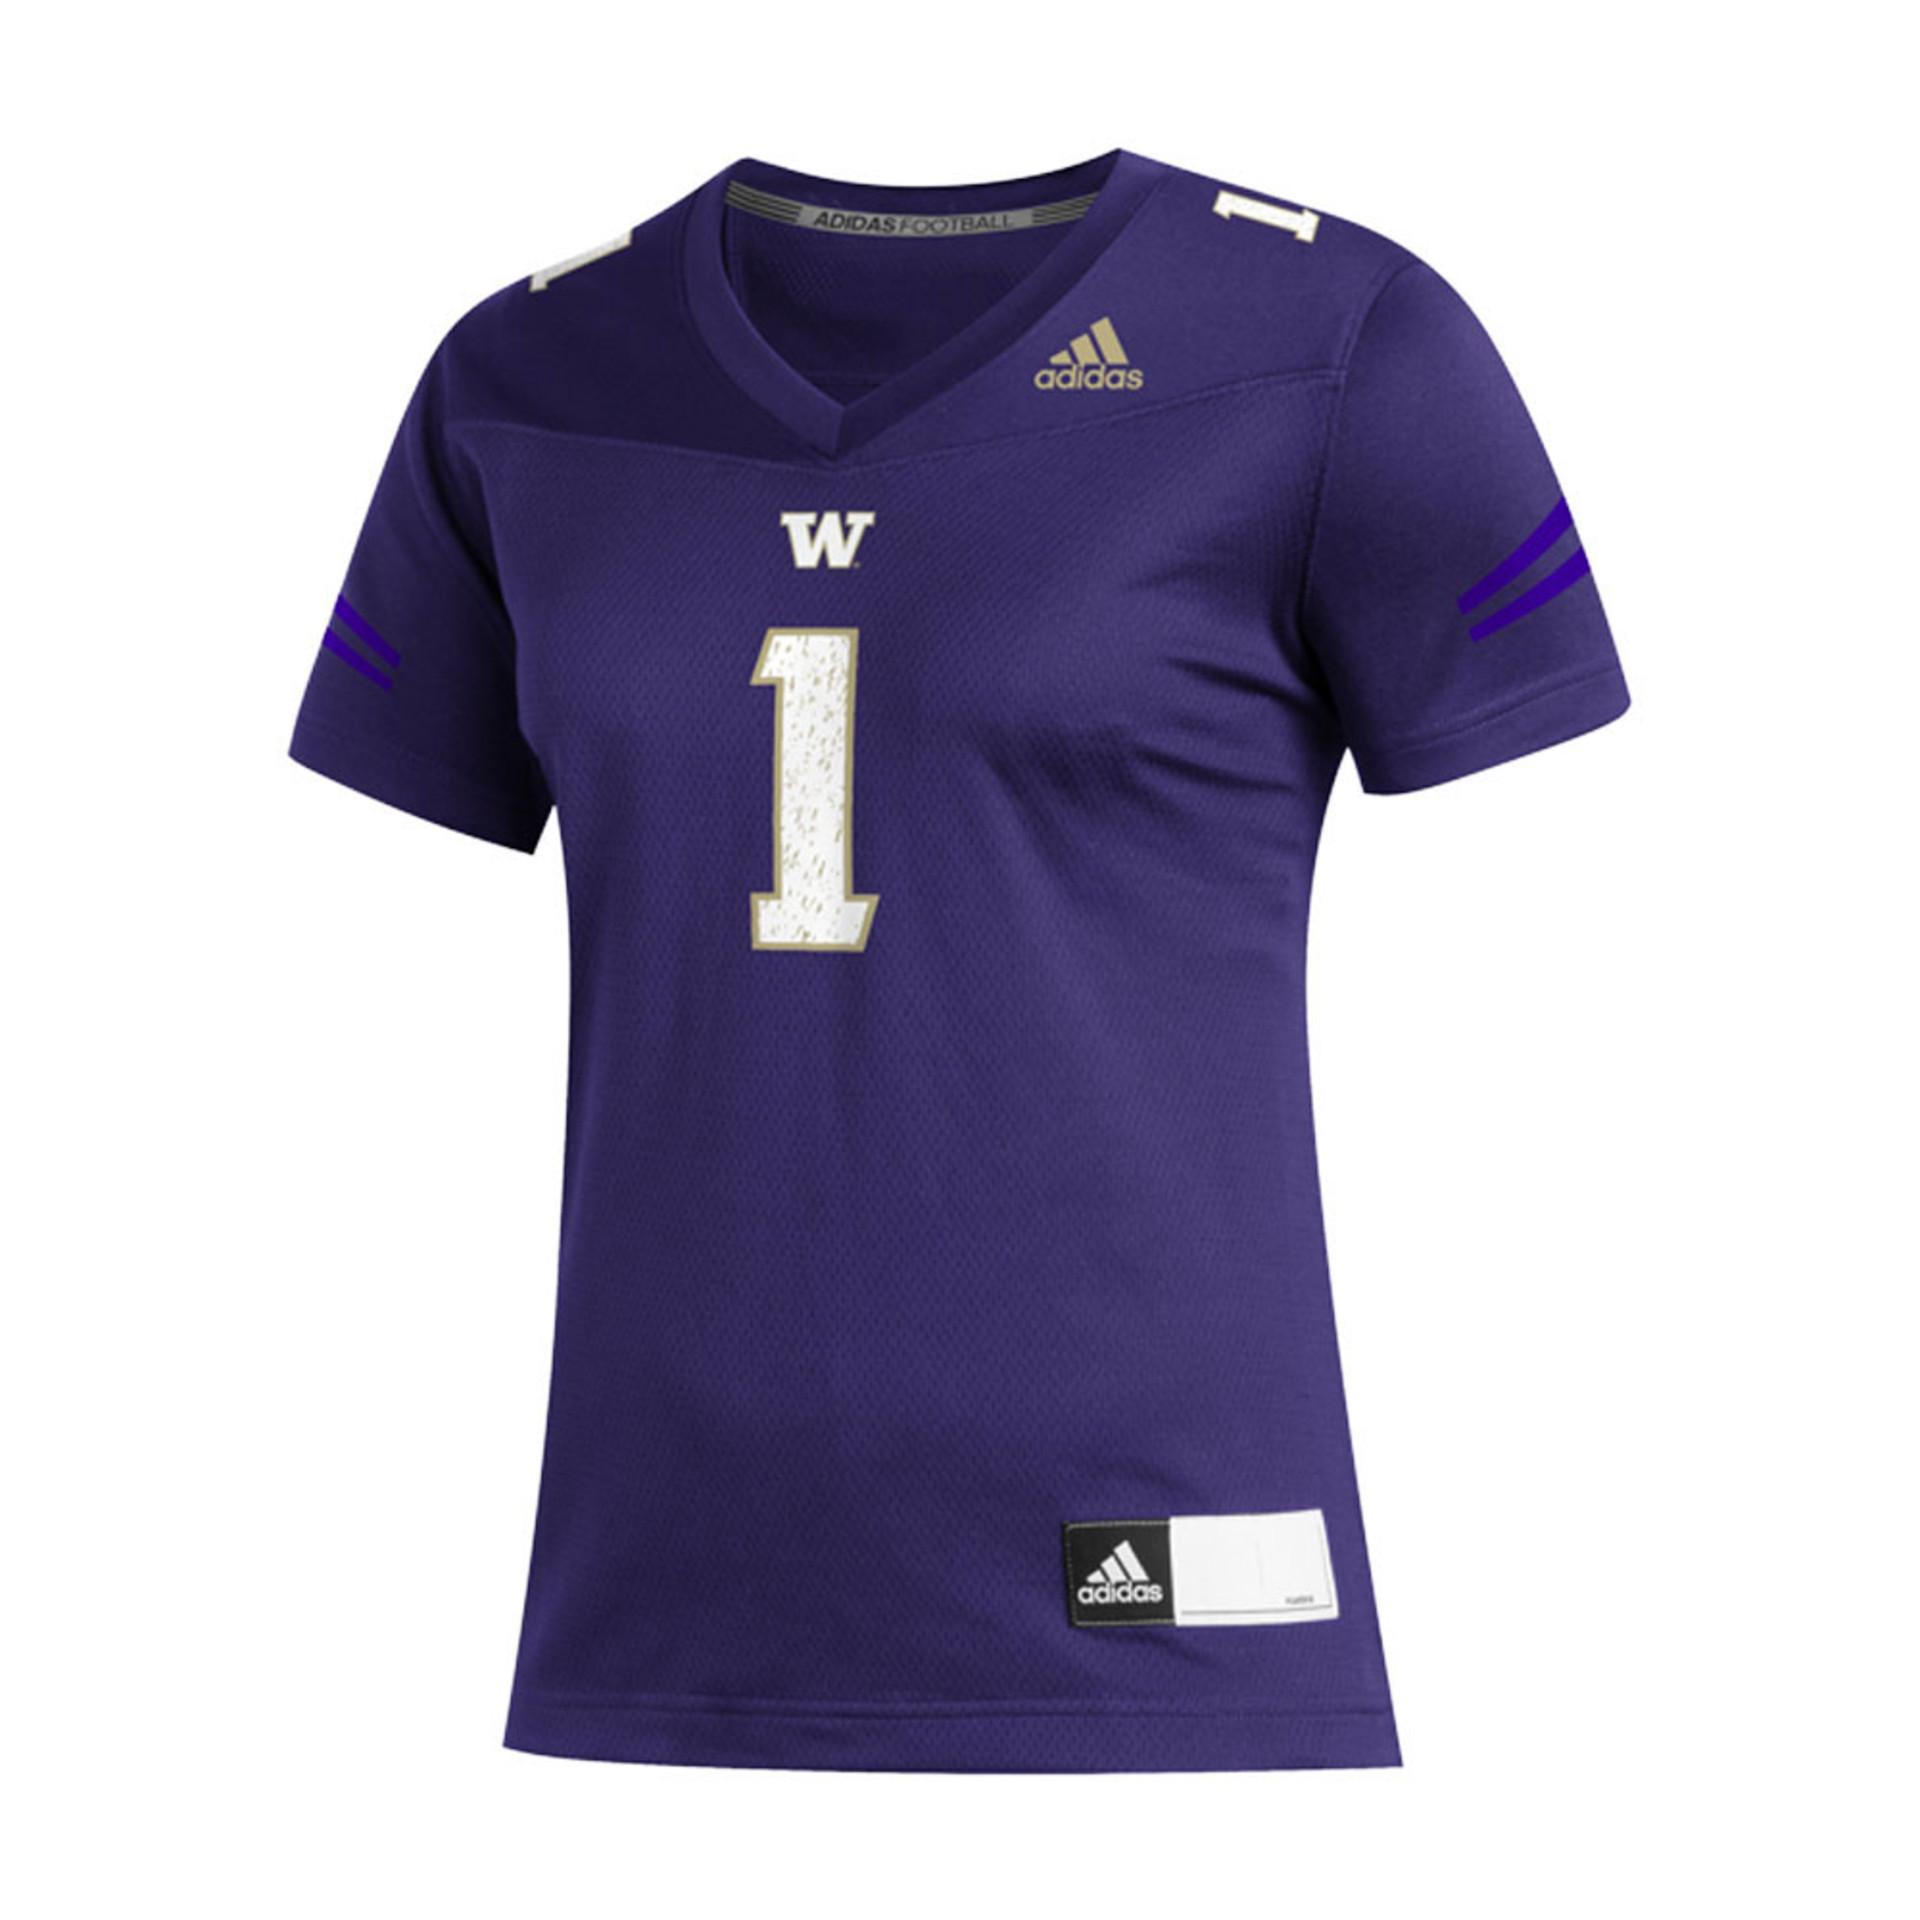 adidas Women's Washington Huskies Replica Football Jersey Purple